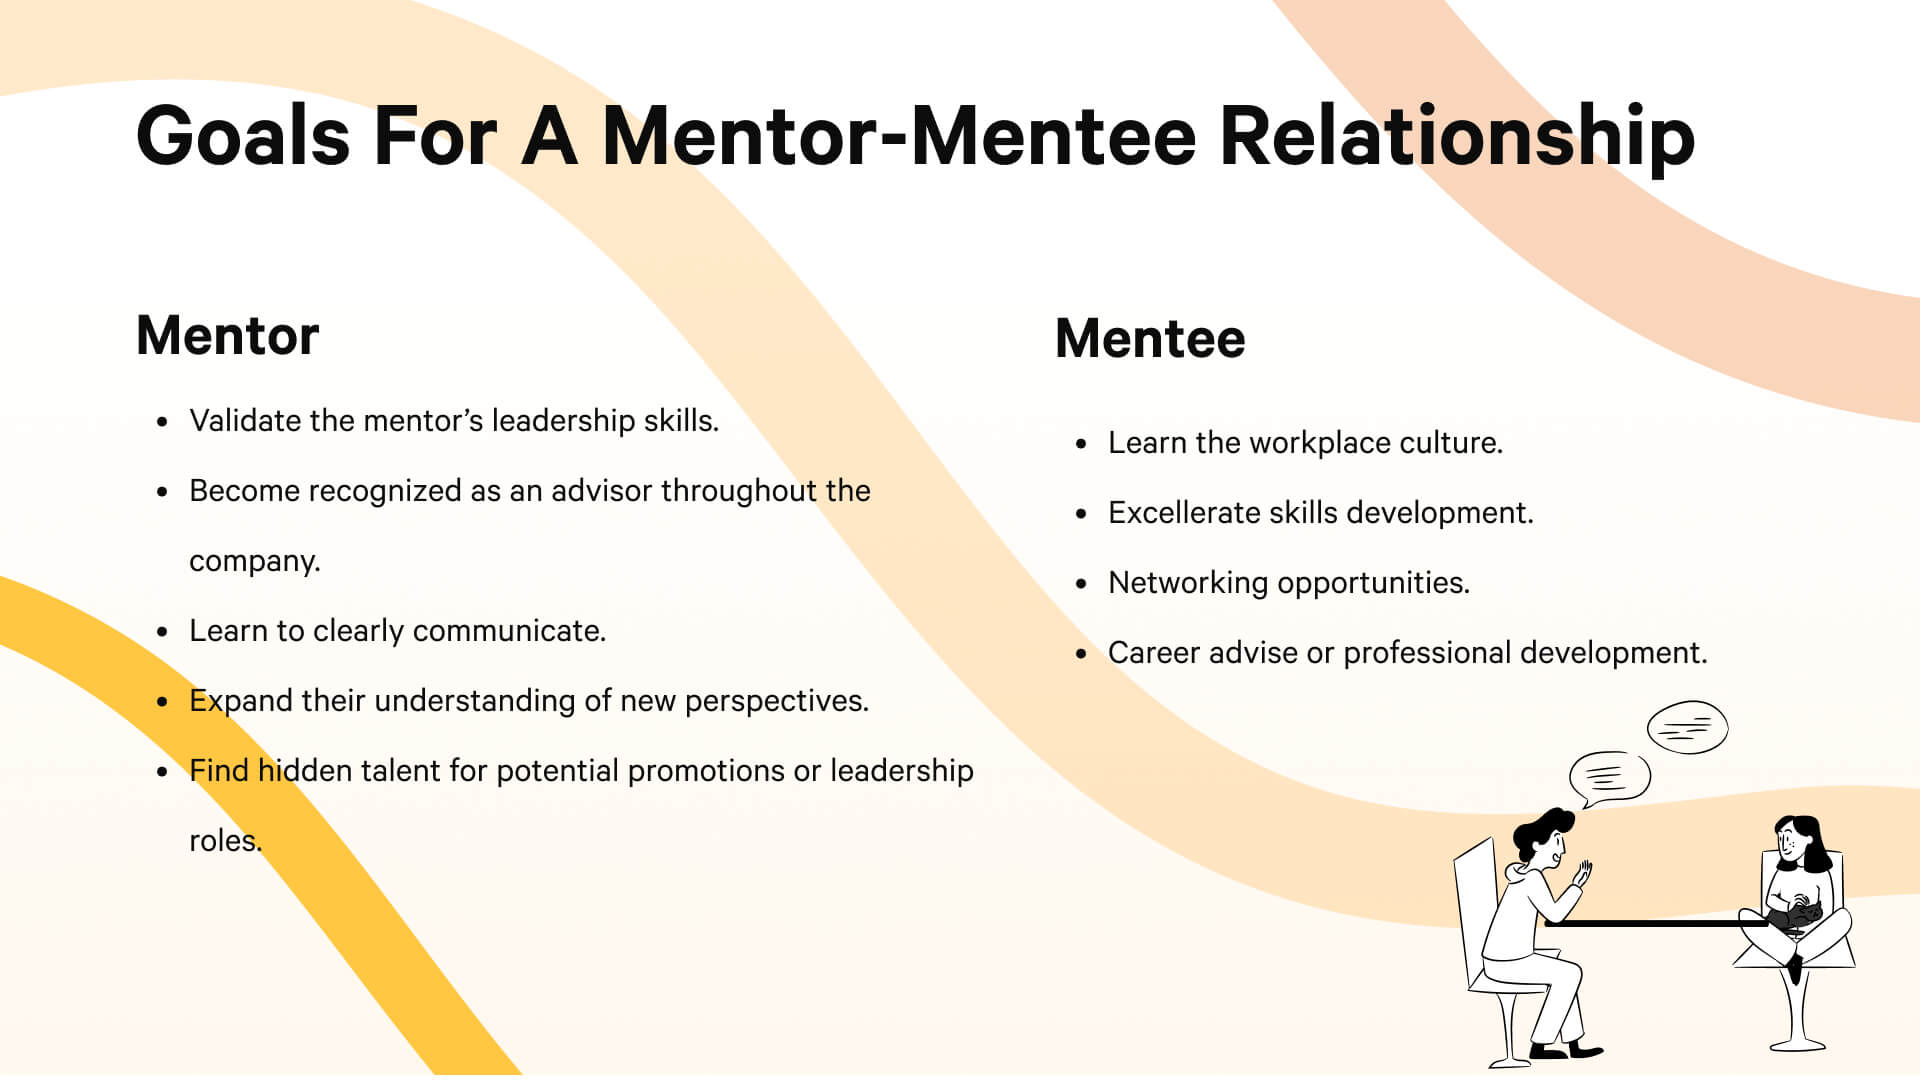 Goals for a Mentor-Mentee Relationship